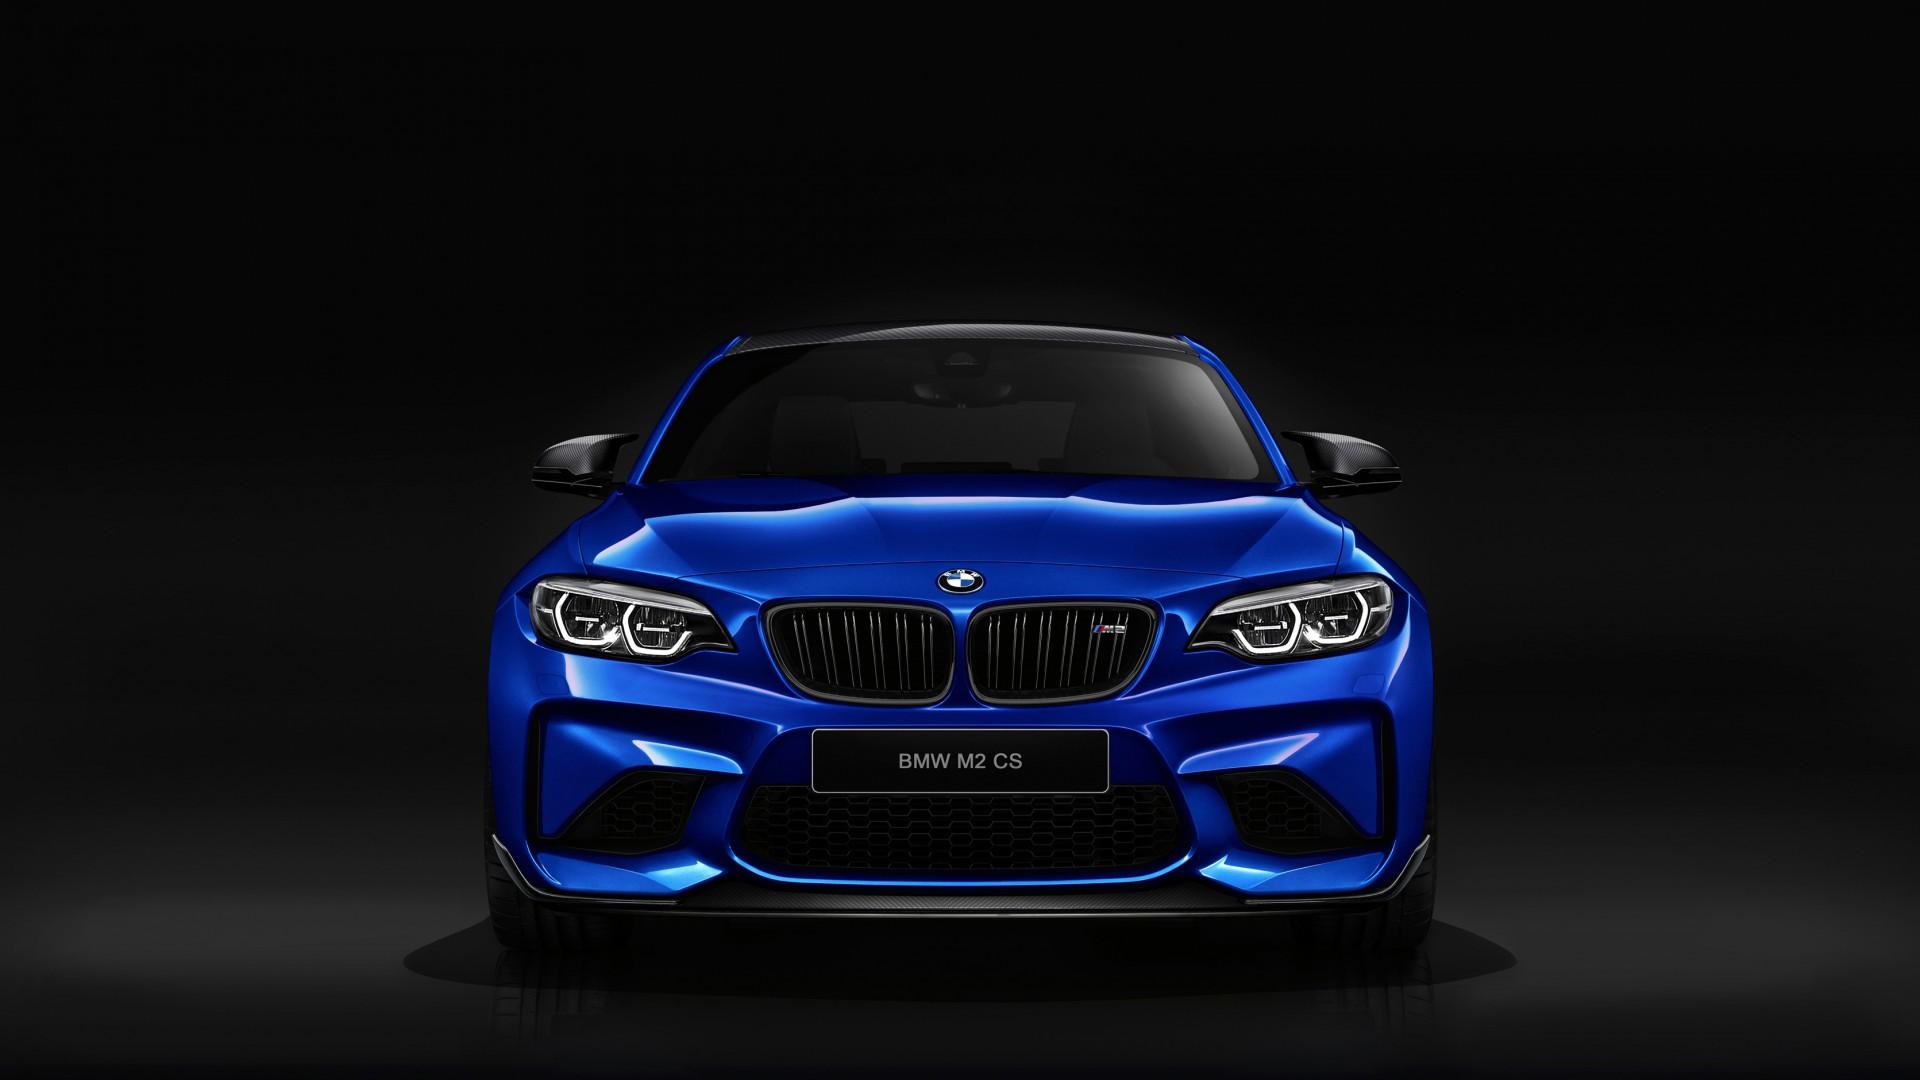 2017 BMW M2 CS Wallpaper HD Car Wallpapers ID 8079